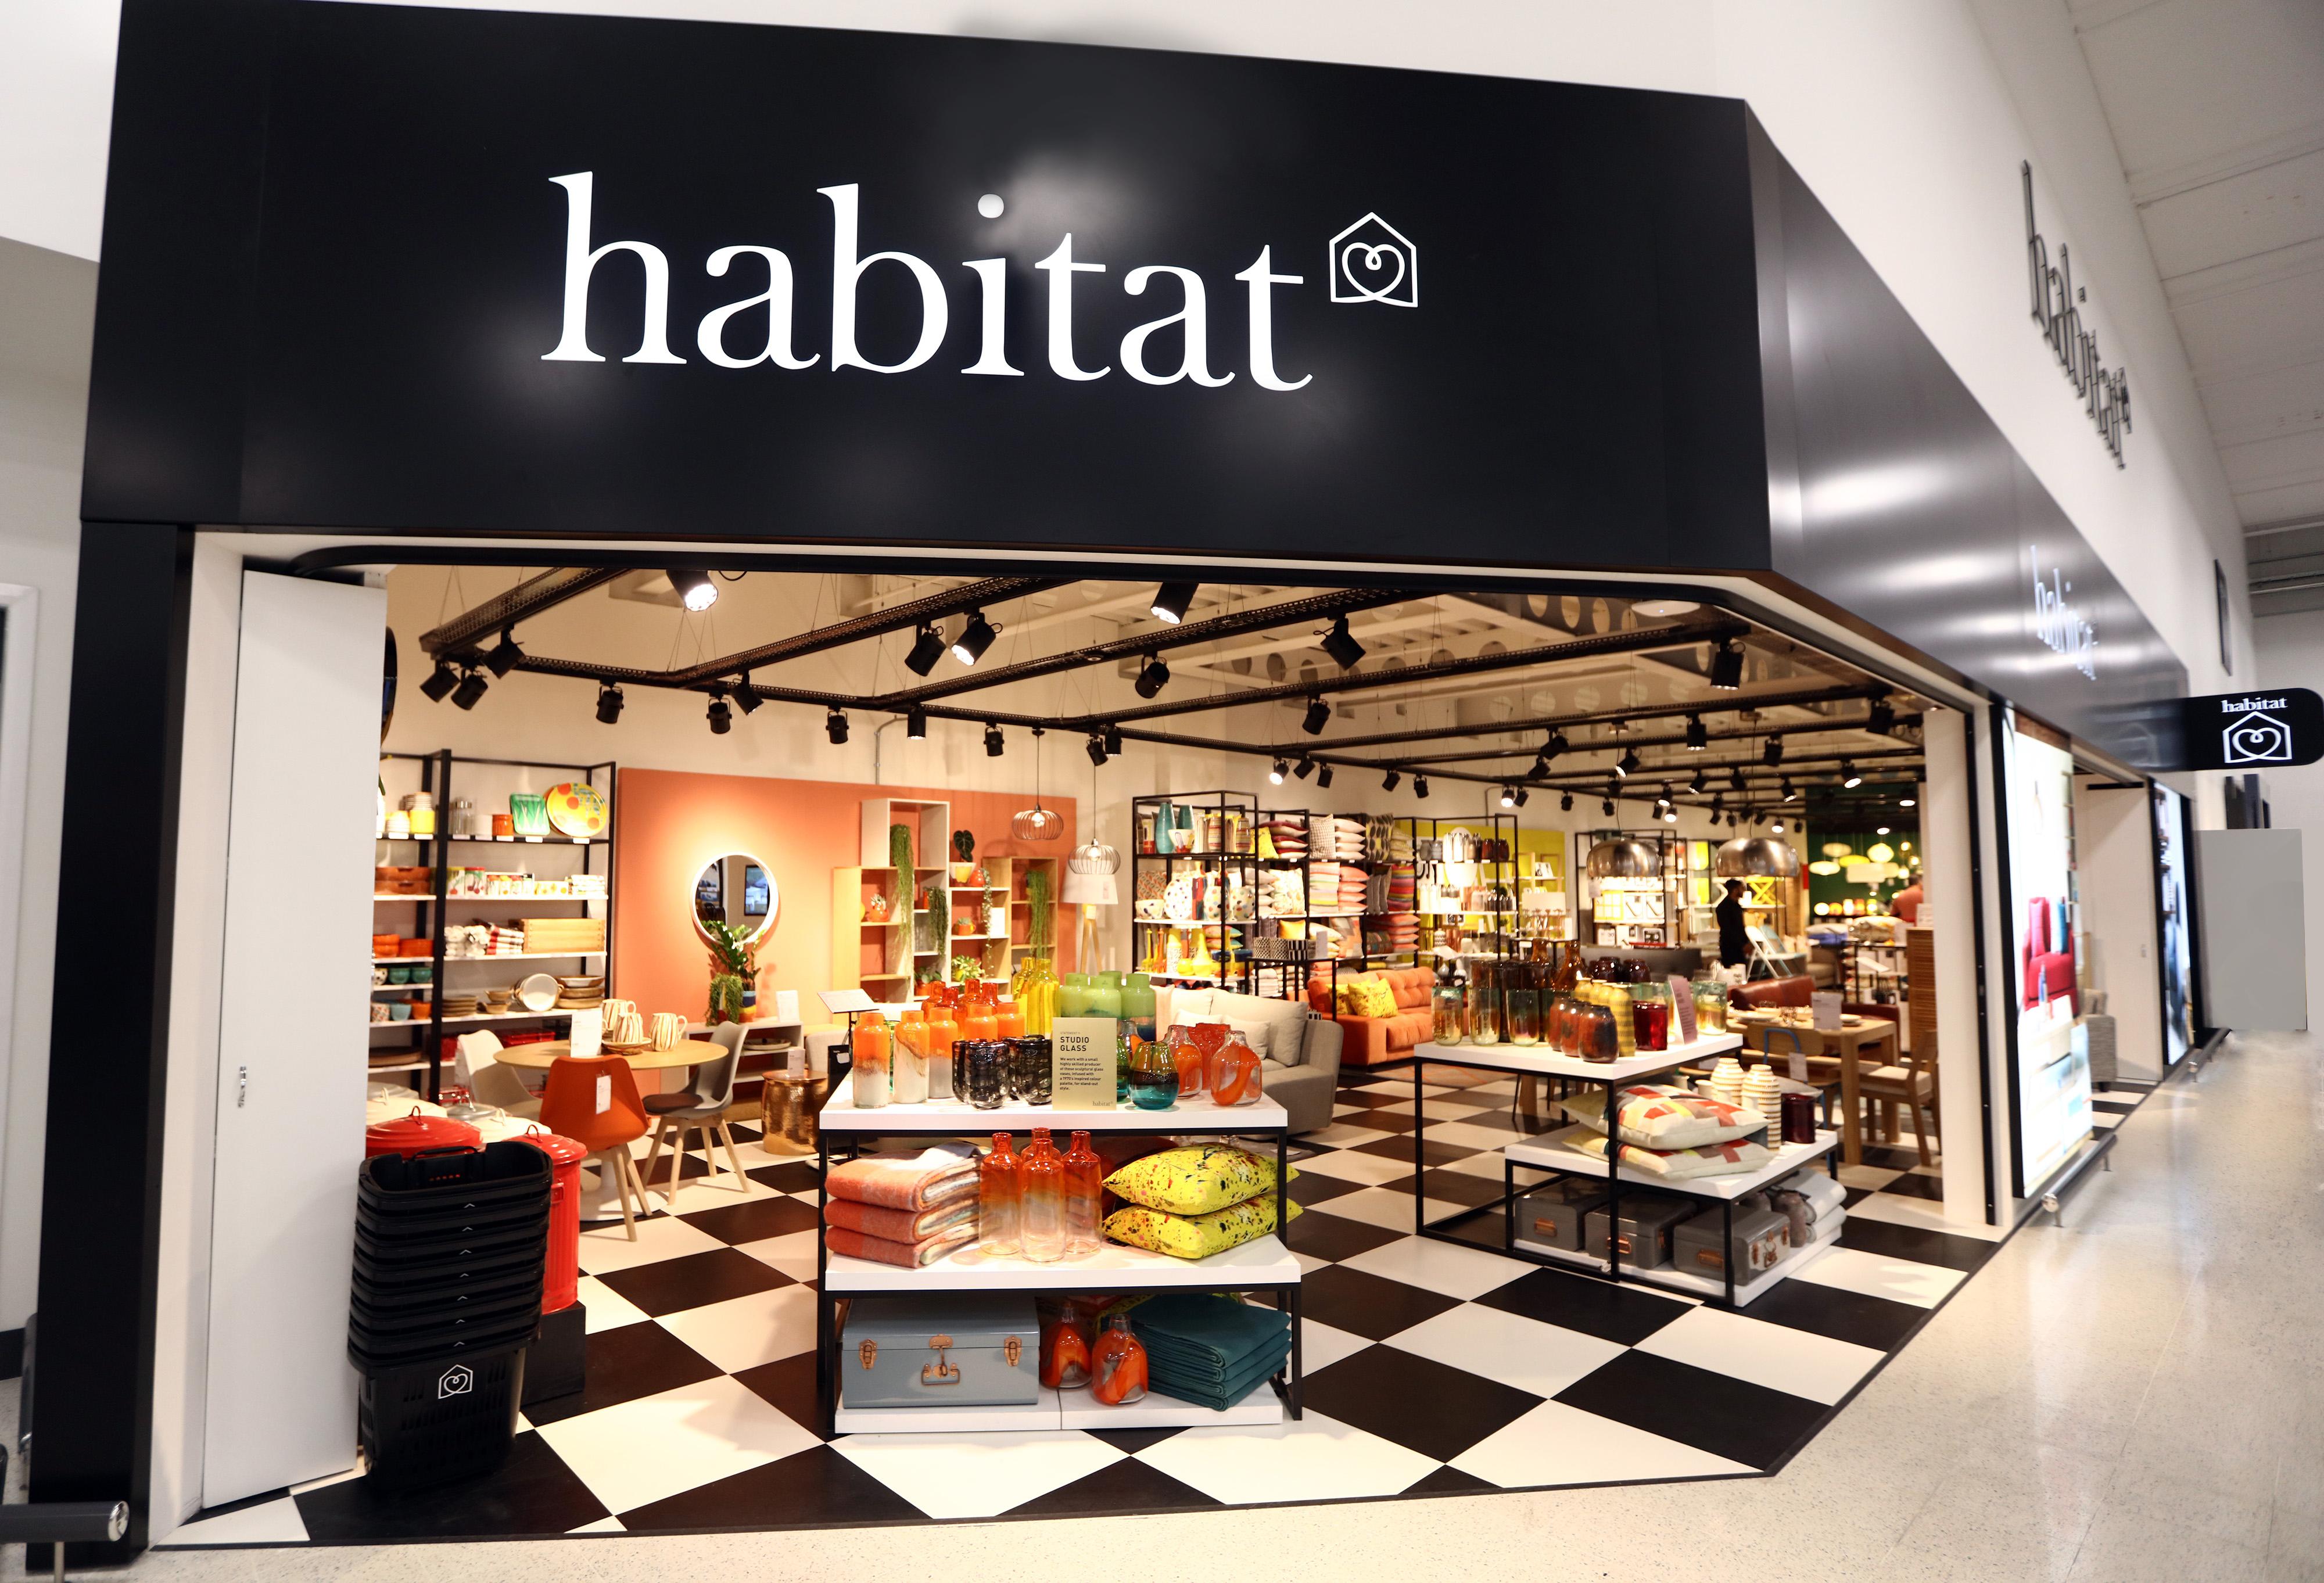 mini-habitat-nine-elms-store-front-embargoed-until-11-10-2016